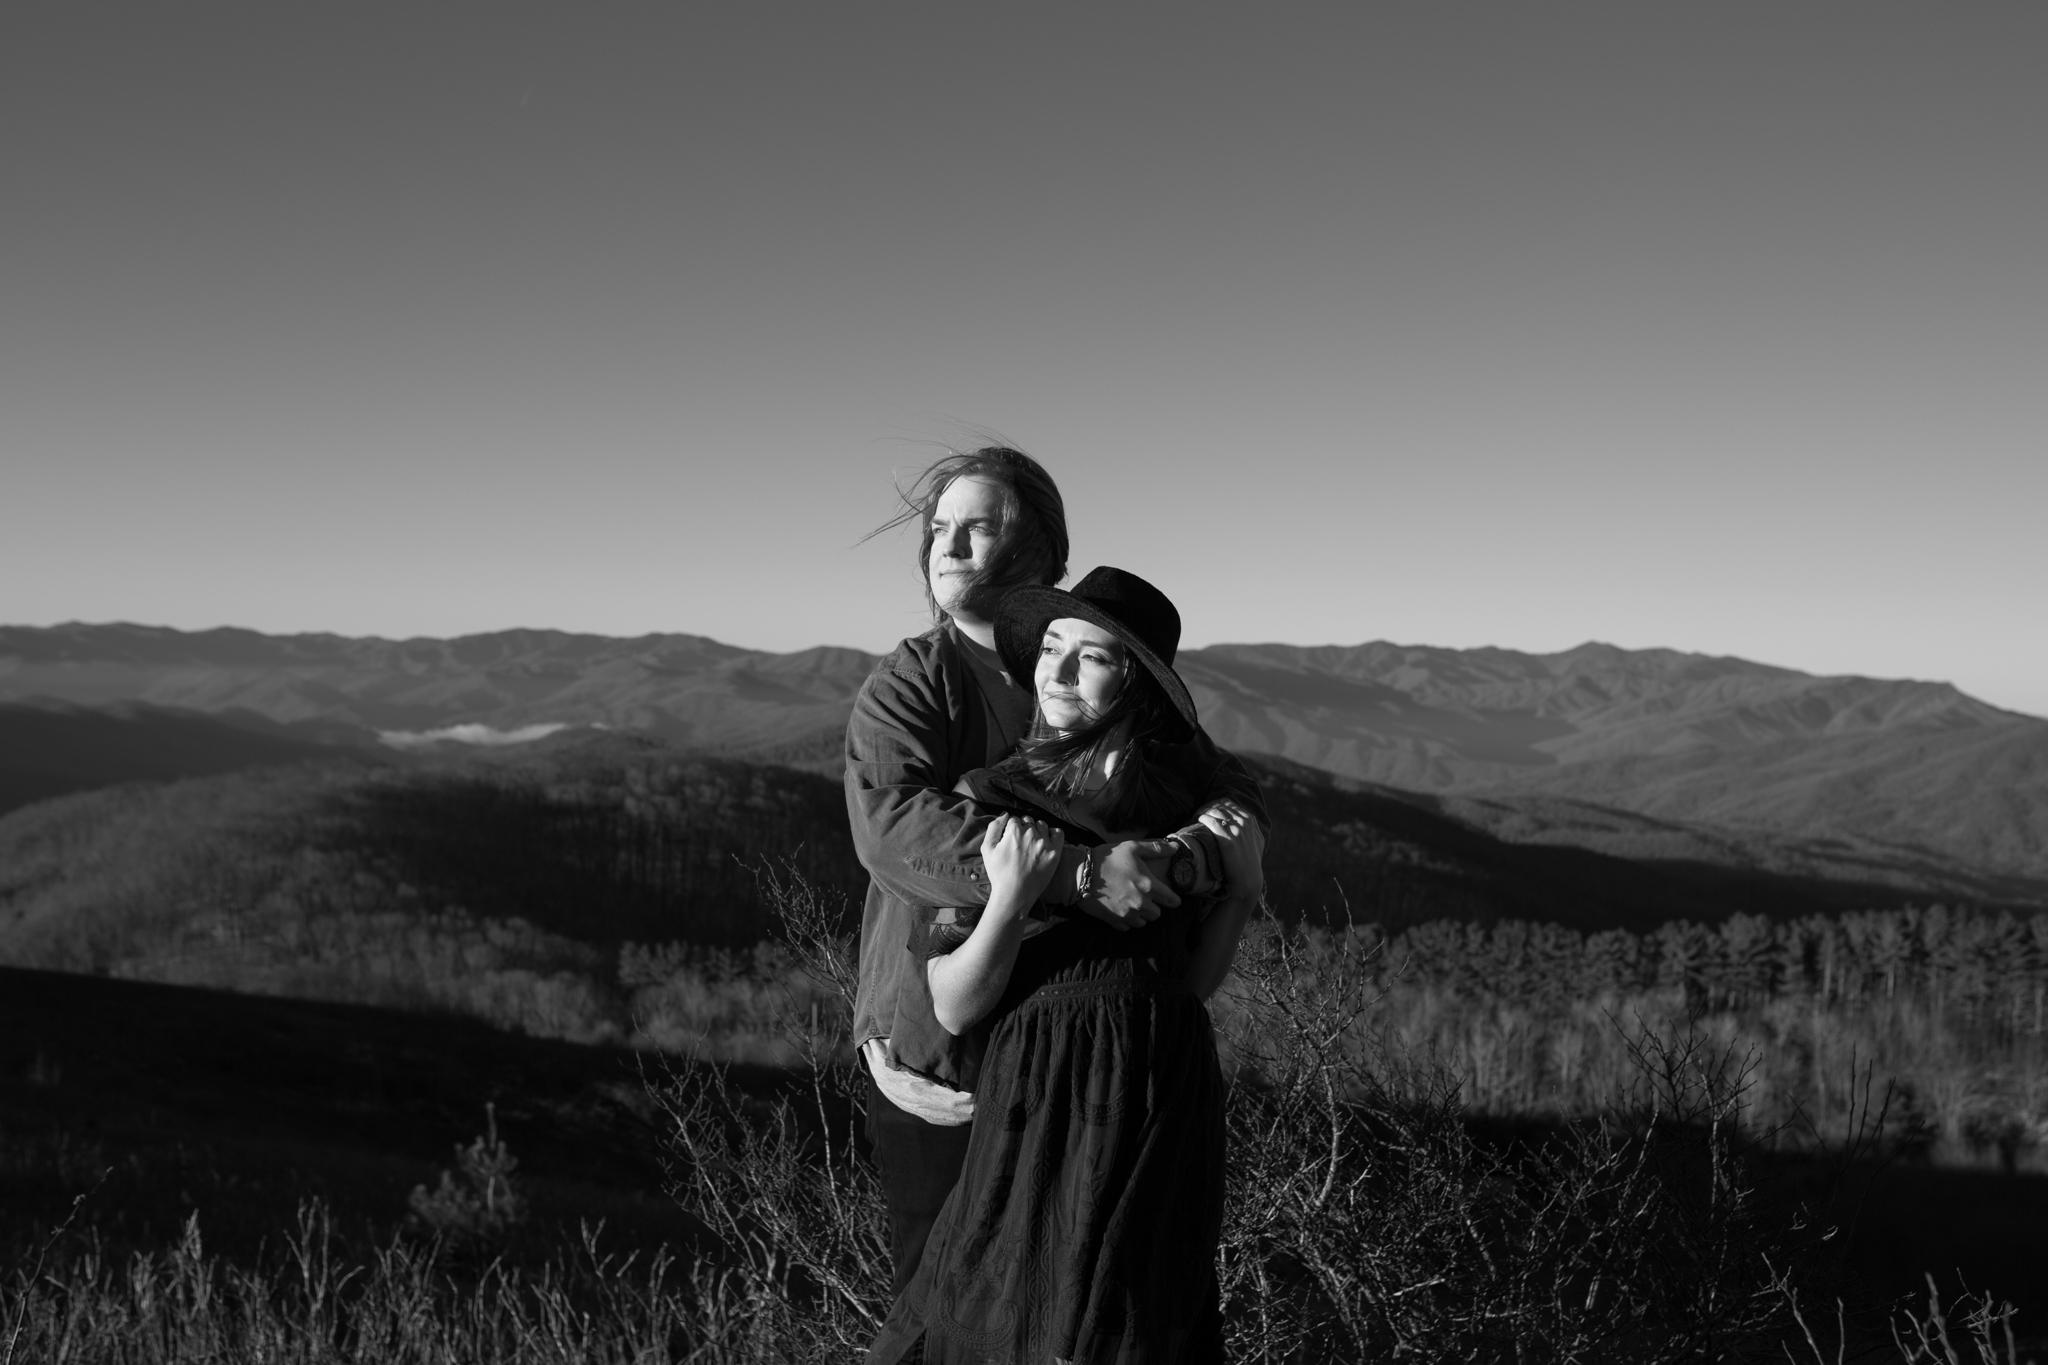 MonicaLeavellPhoto-MaxPatch-NorthCarolina-Adventure-Elopement-Photographer-JessandRemy-49.jpg